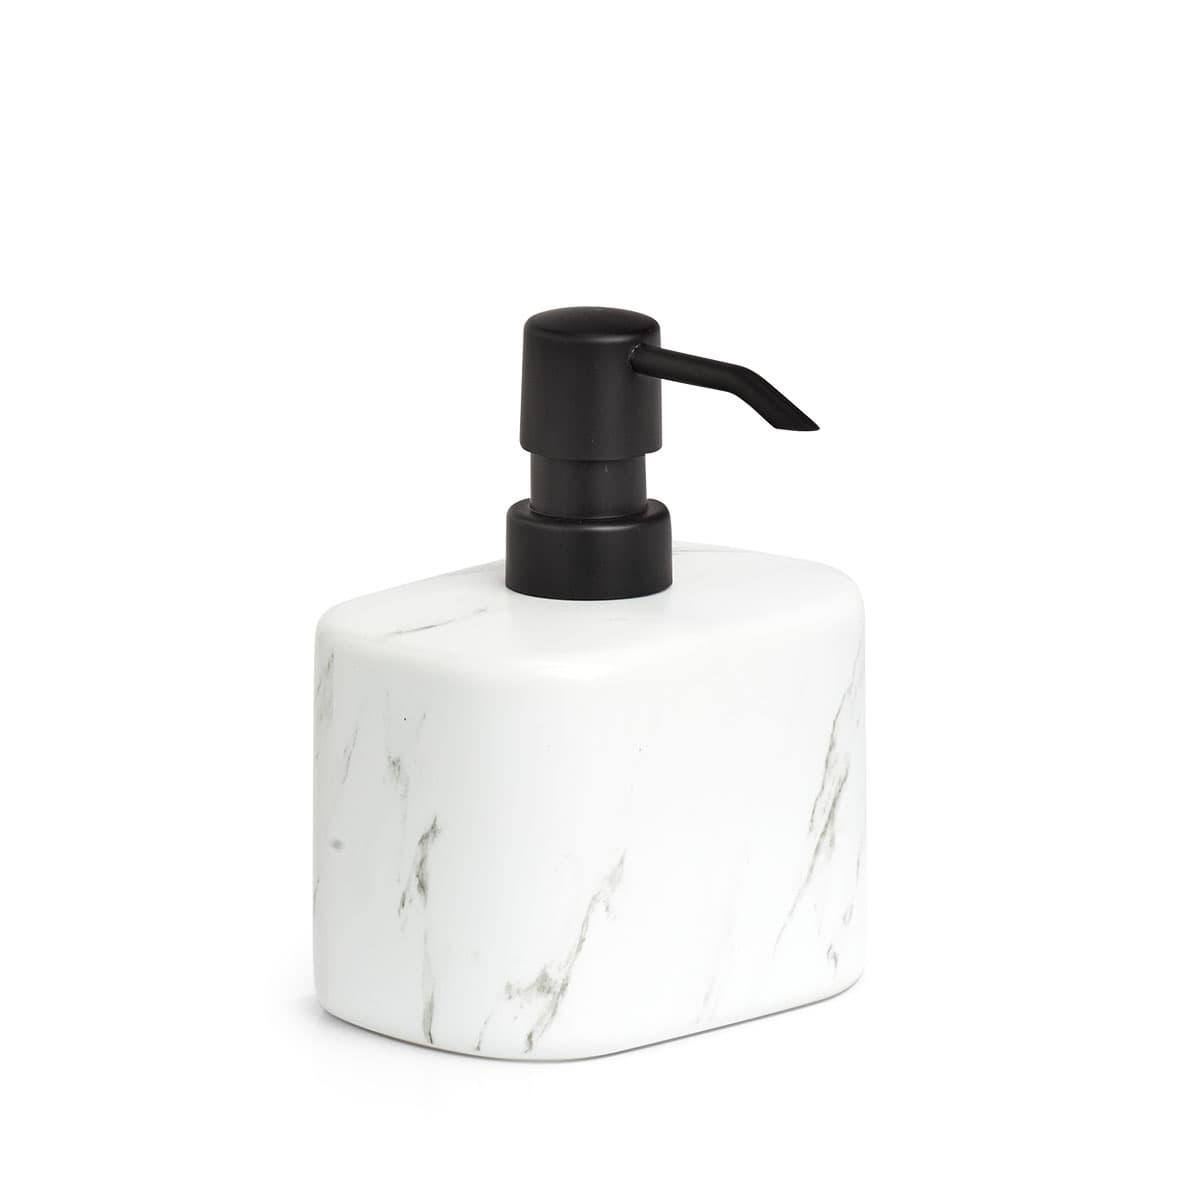 Dozator pentru sapun din ceramica, Marble Alb / Negru, L11xl8,1xH13,2 cm imagine